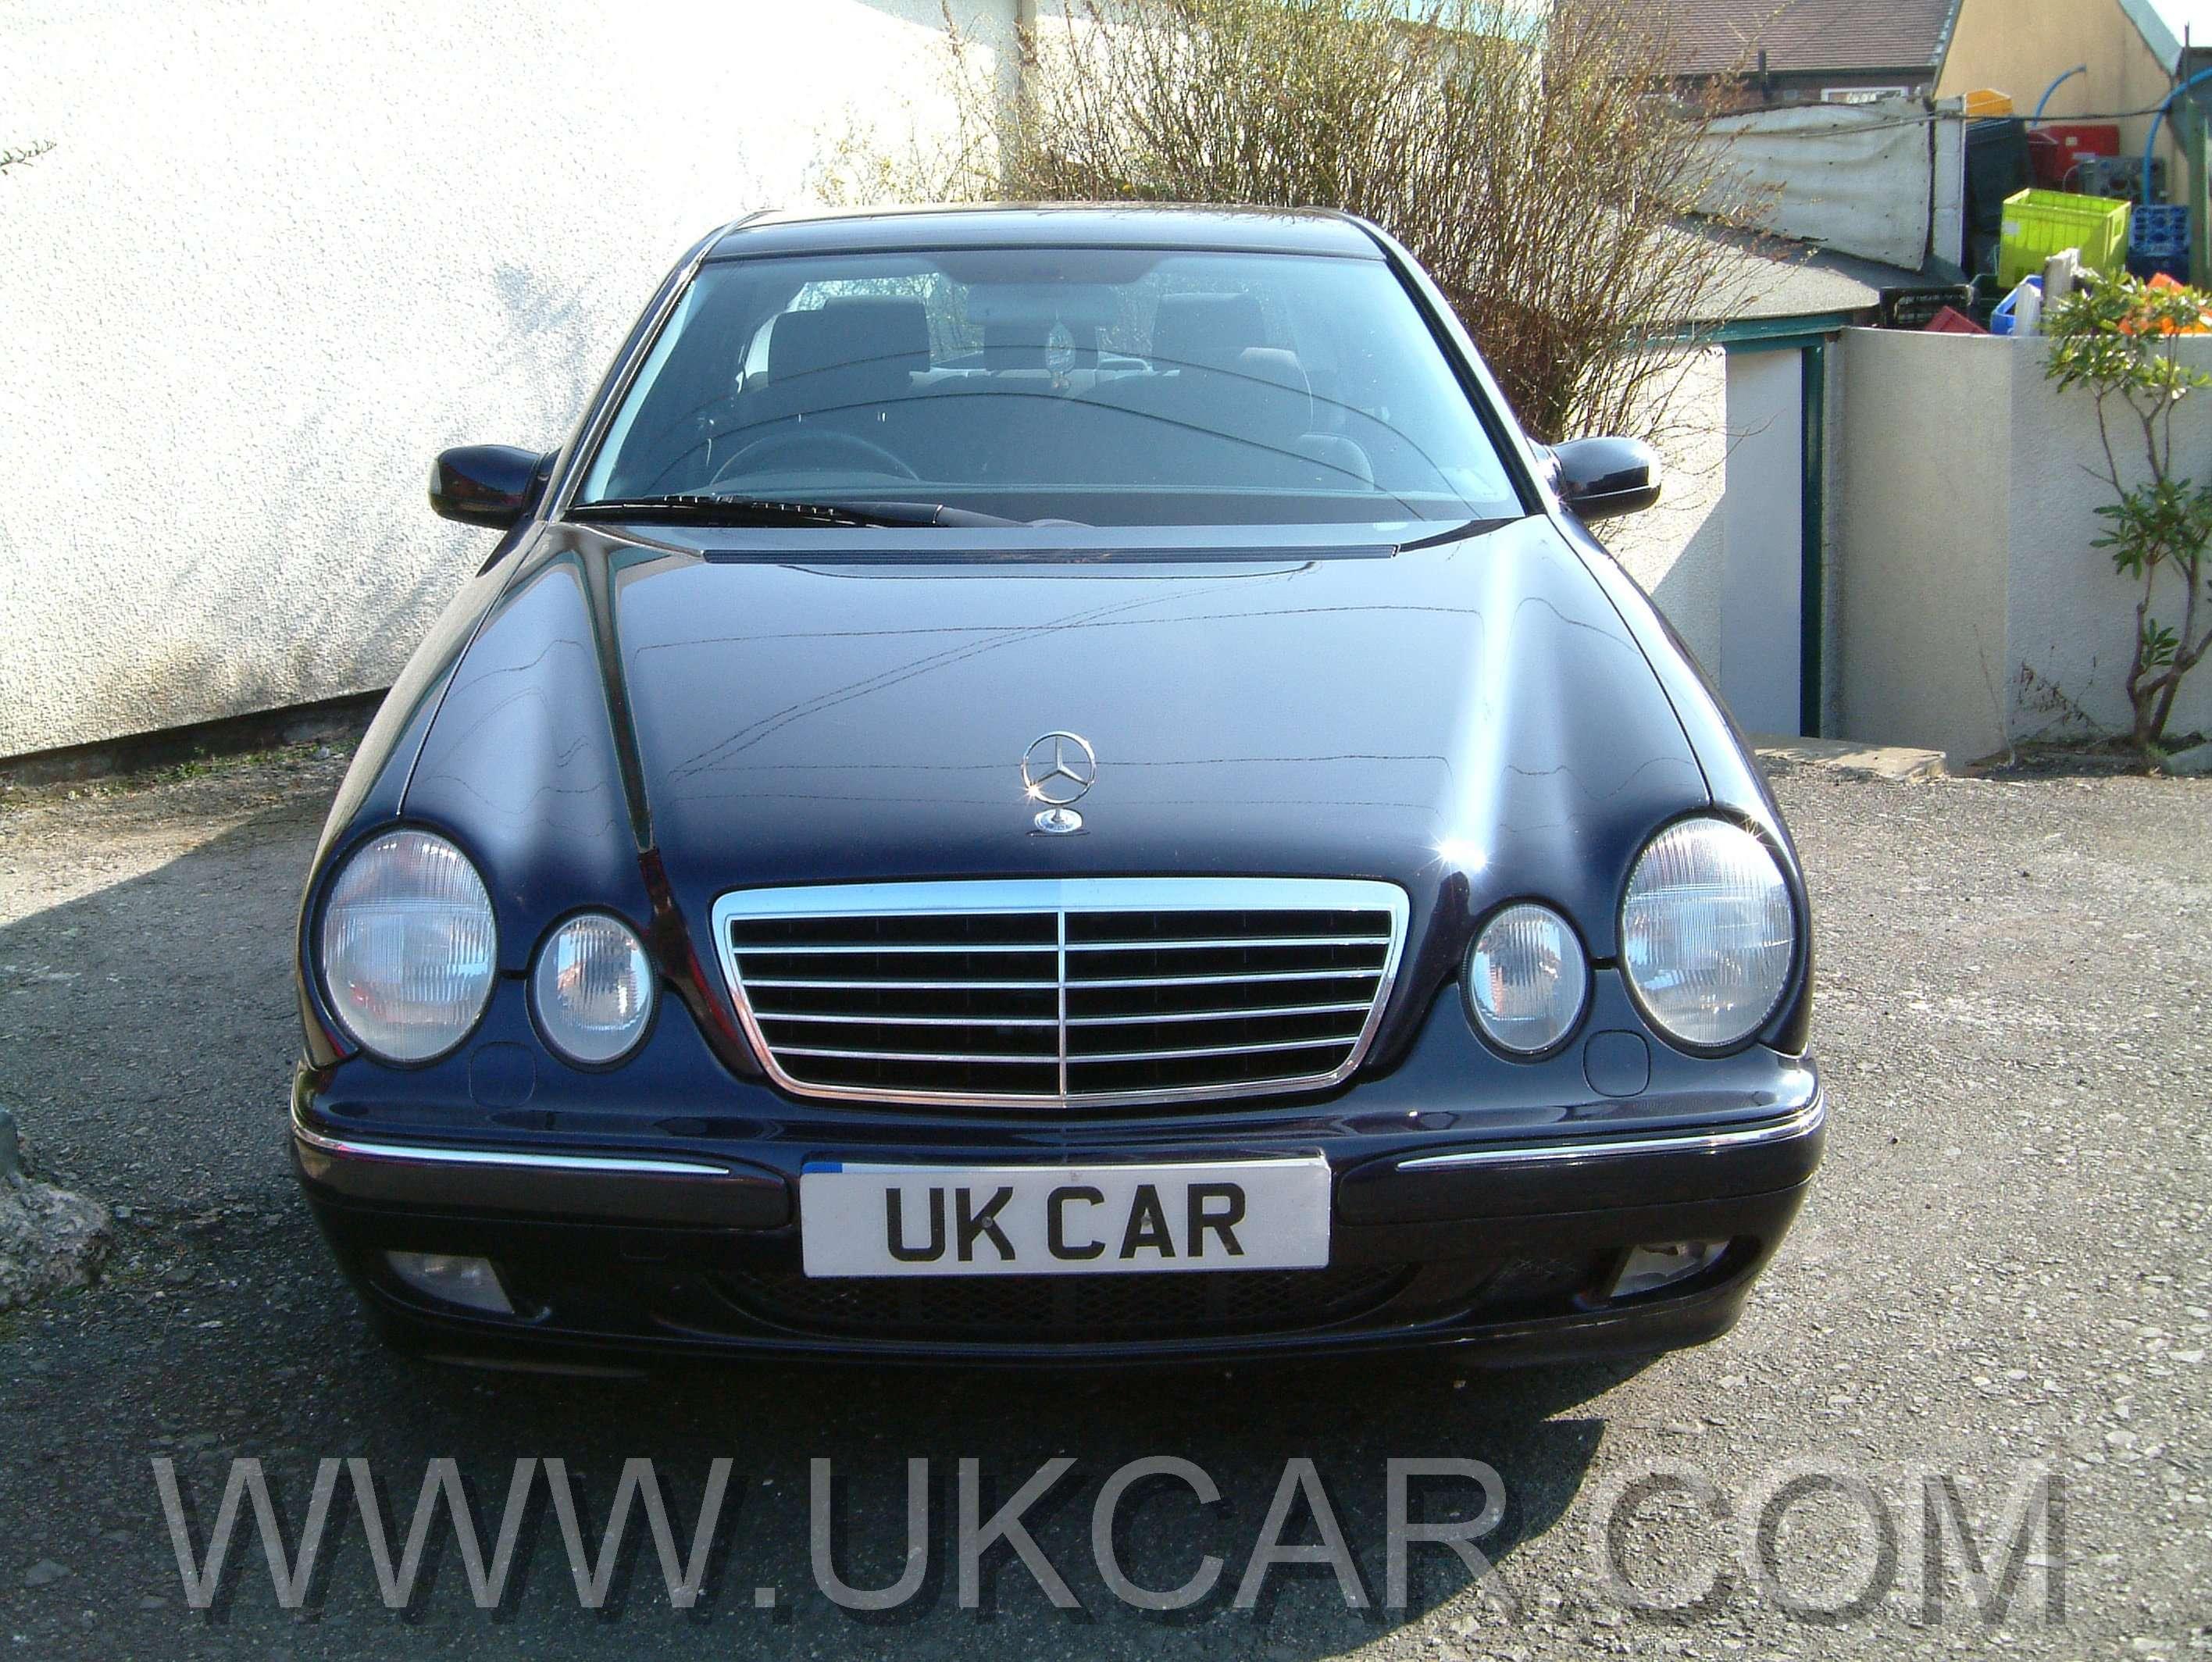 http://www.ukcar.com/road_tests/mercedes/e-class/big/Mercedes-E-Class-Avantgarde-front.jpg